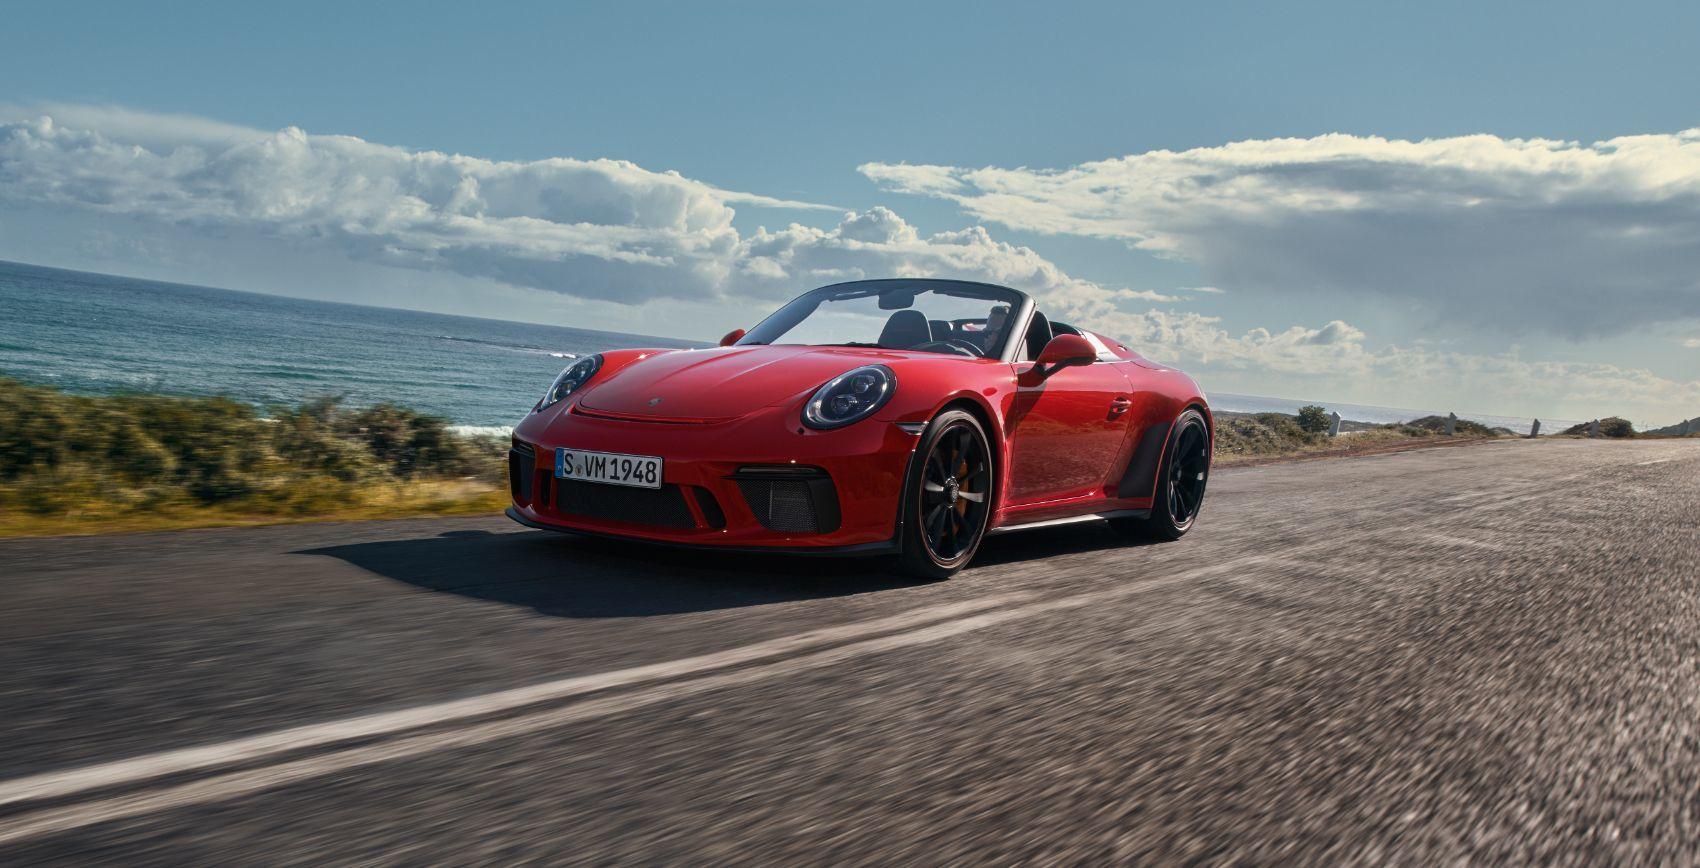 2019 Porsche 911 Speedster: Consult Your Doctor Before Driving!